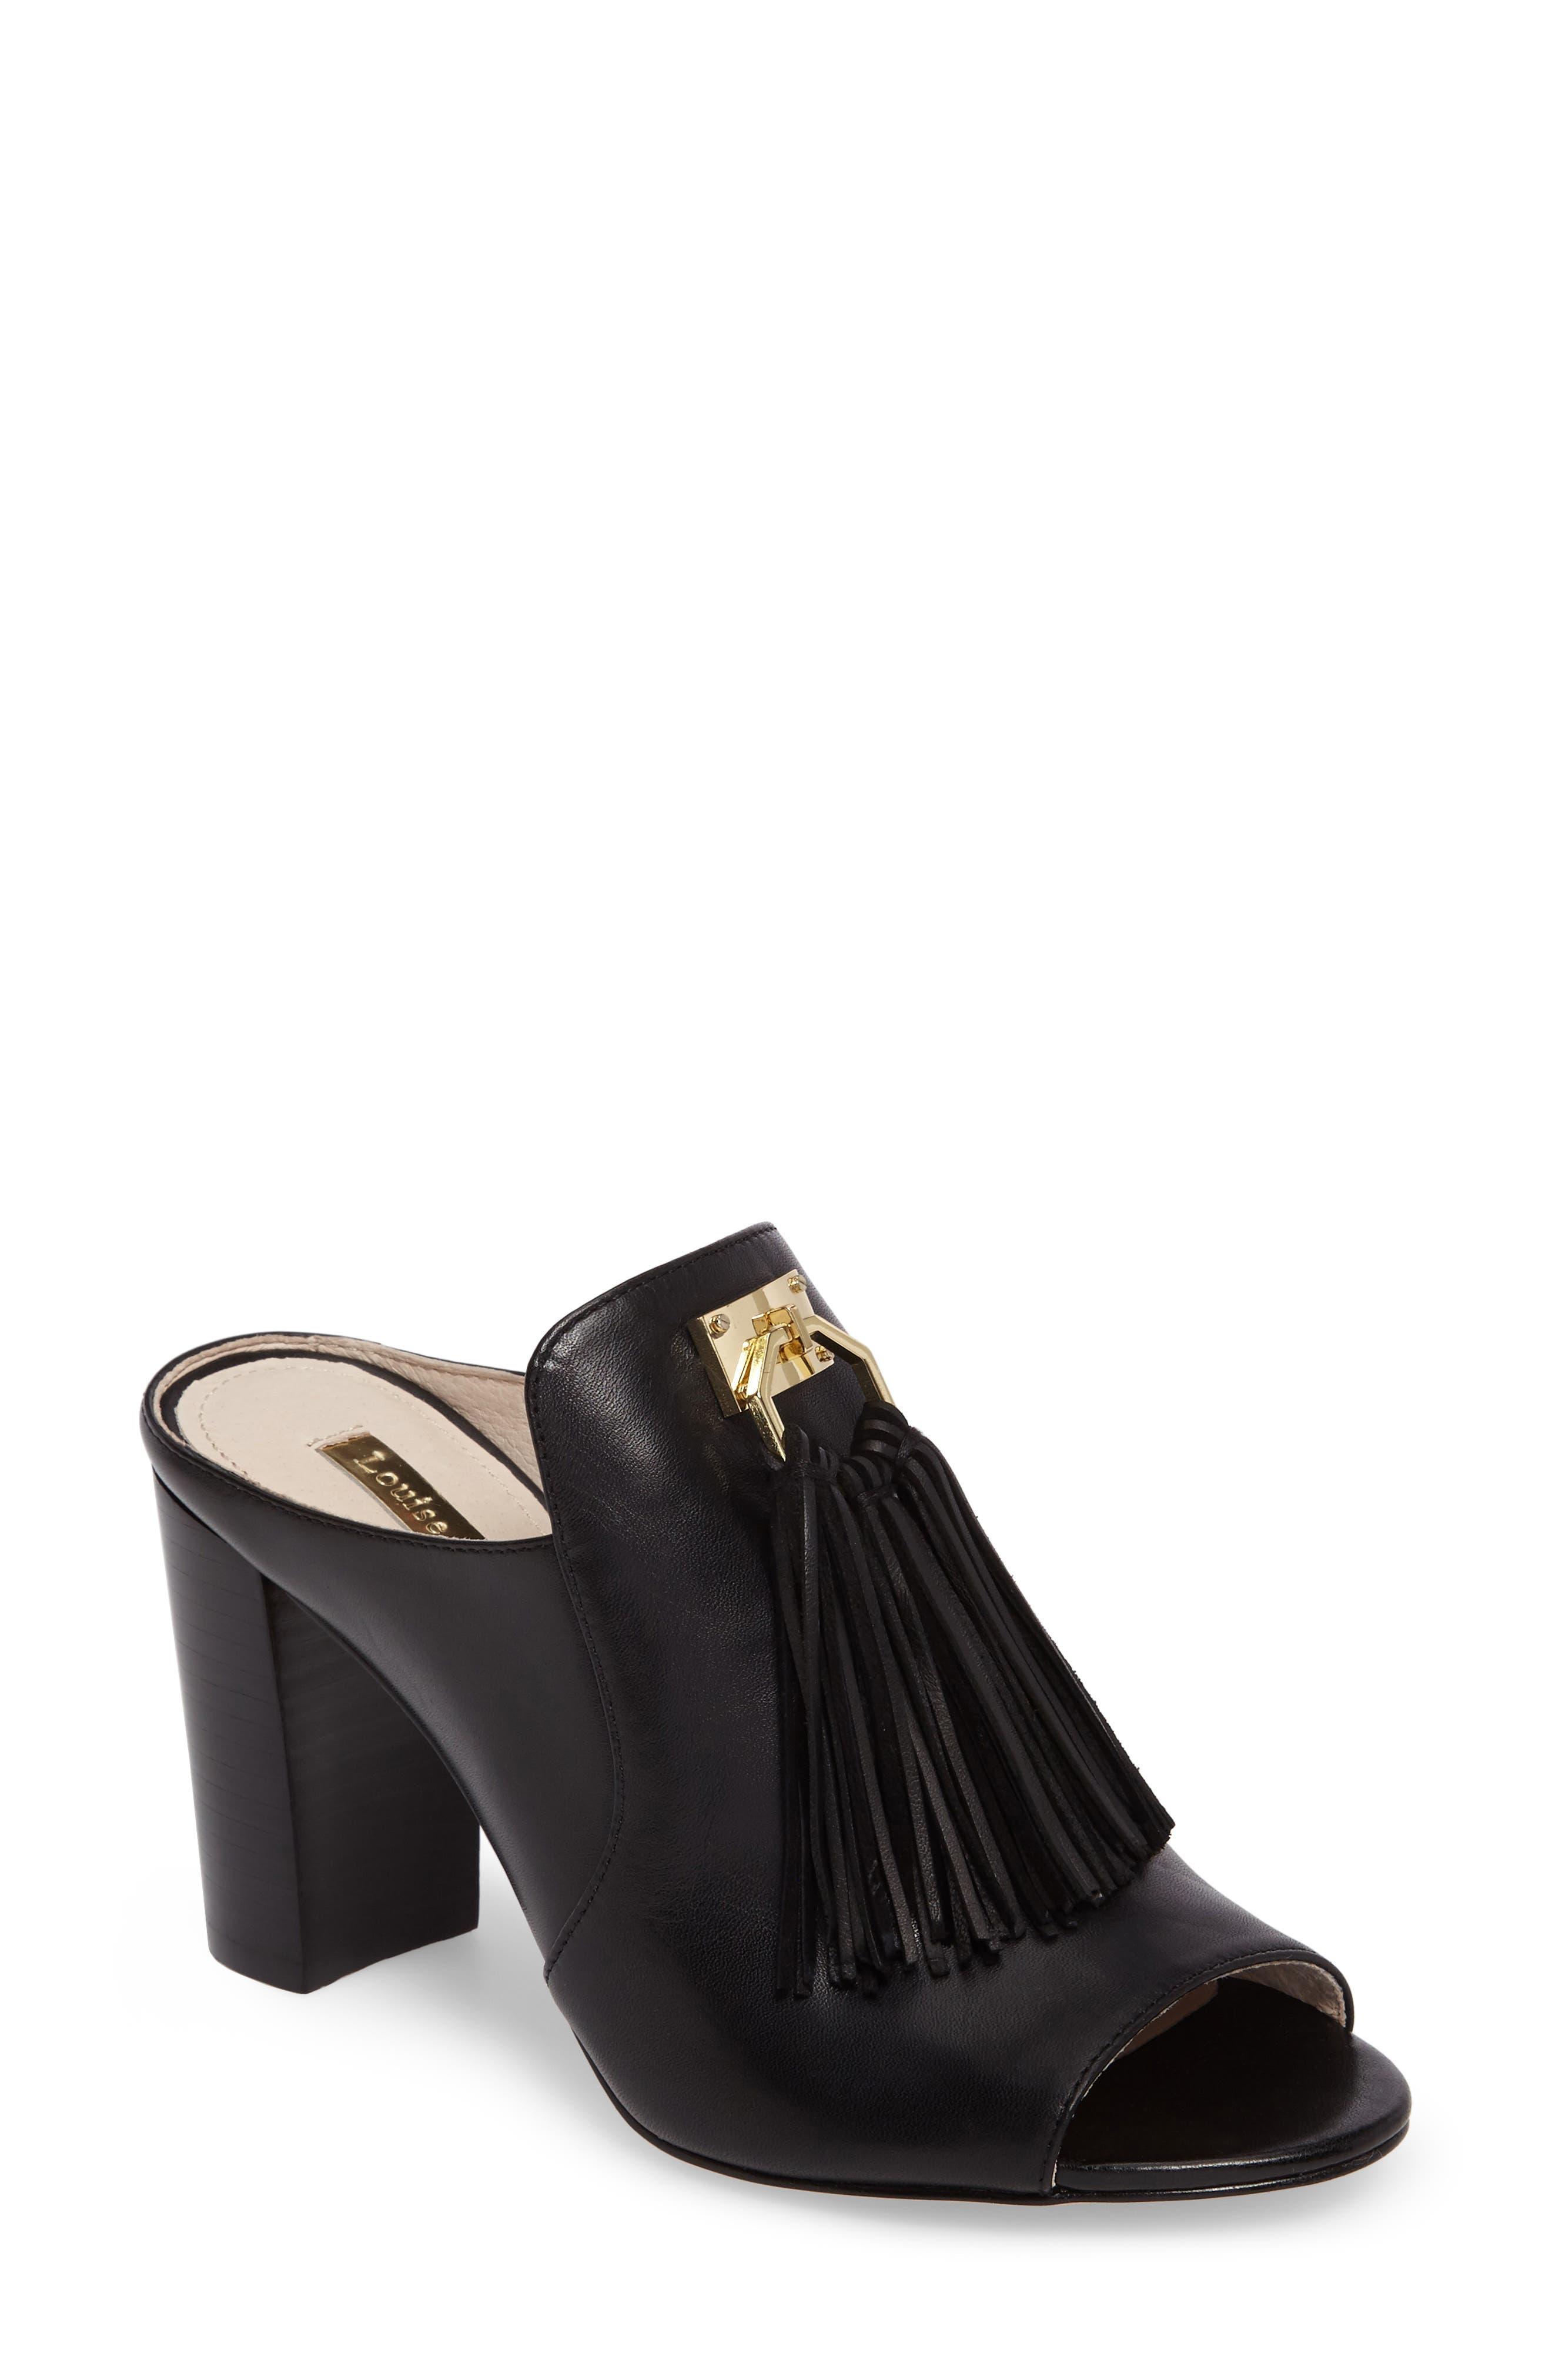 Main Image - Louise et Cie Kemi Block Heel Sandal (Women)